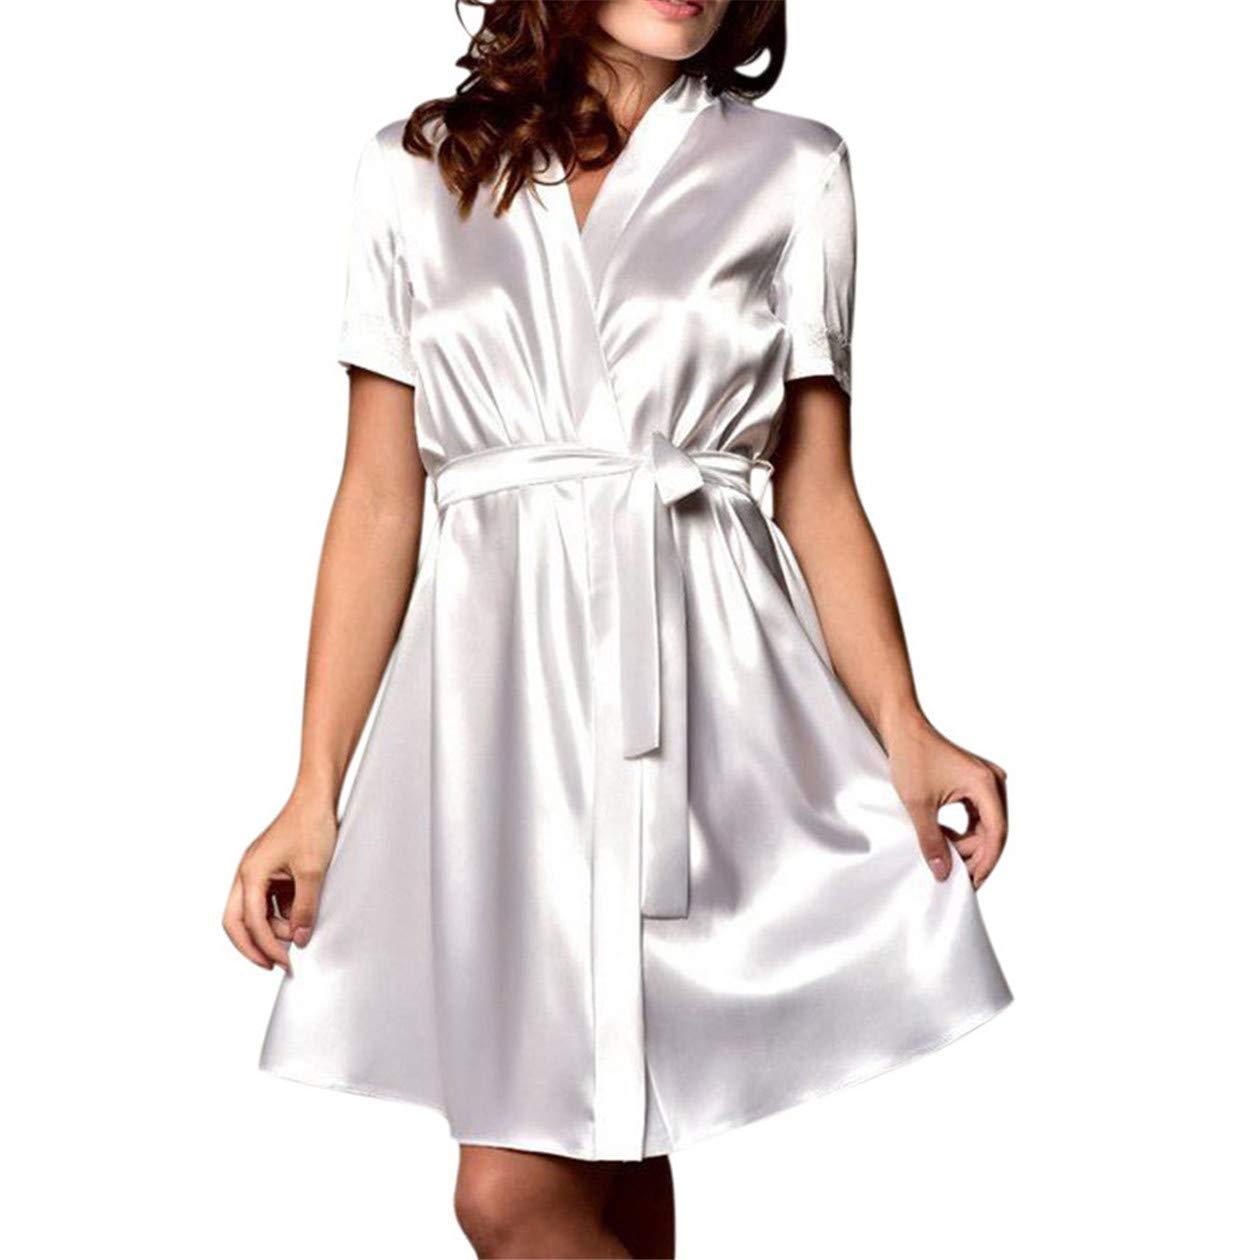 TIFENNY Women's Satin Nightdress Soft Silk Backless Lace Lingerie Nightgown Sleepwear Summer Sexy Short Sleeve Robe